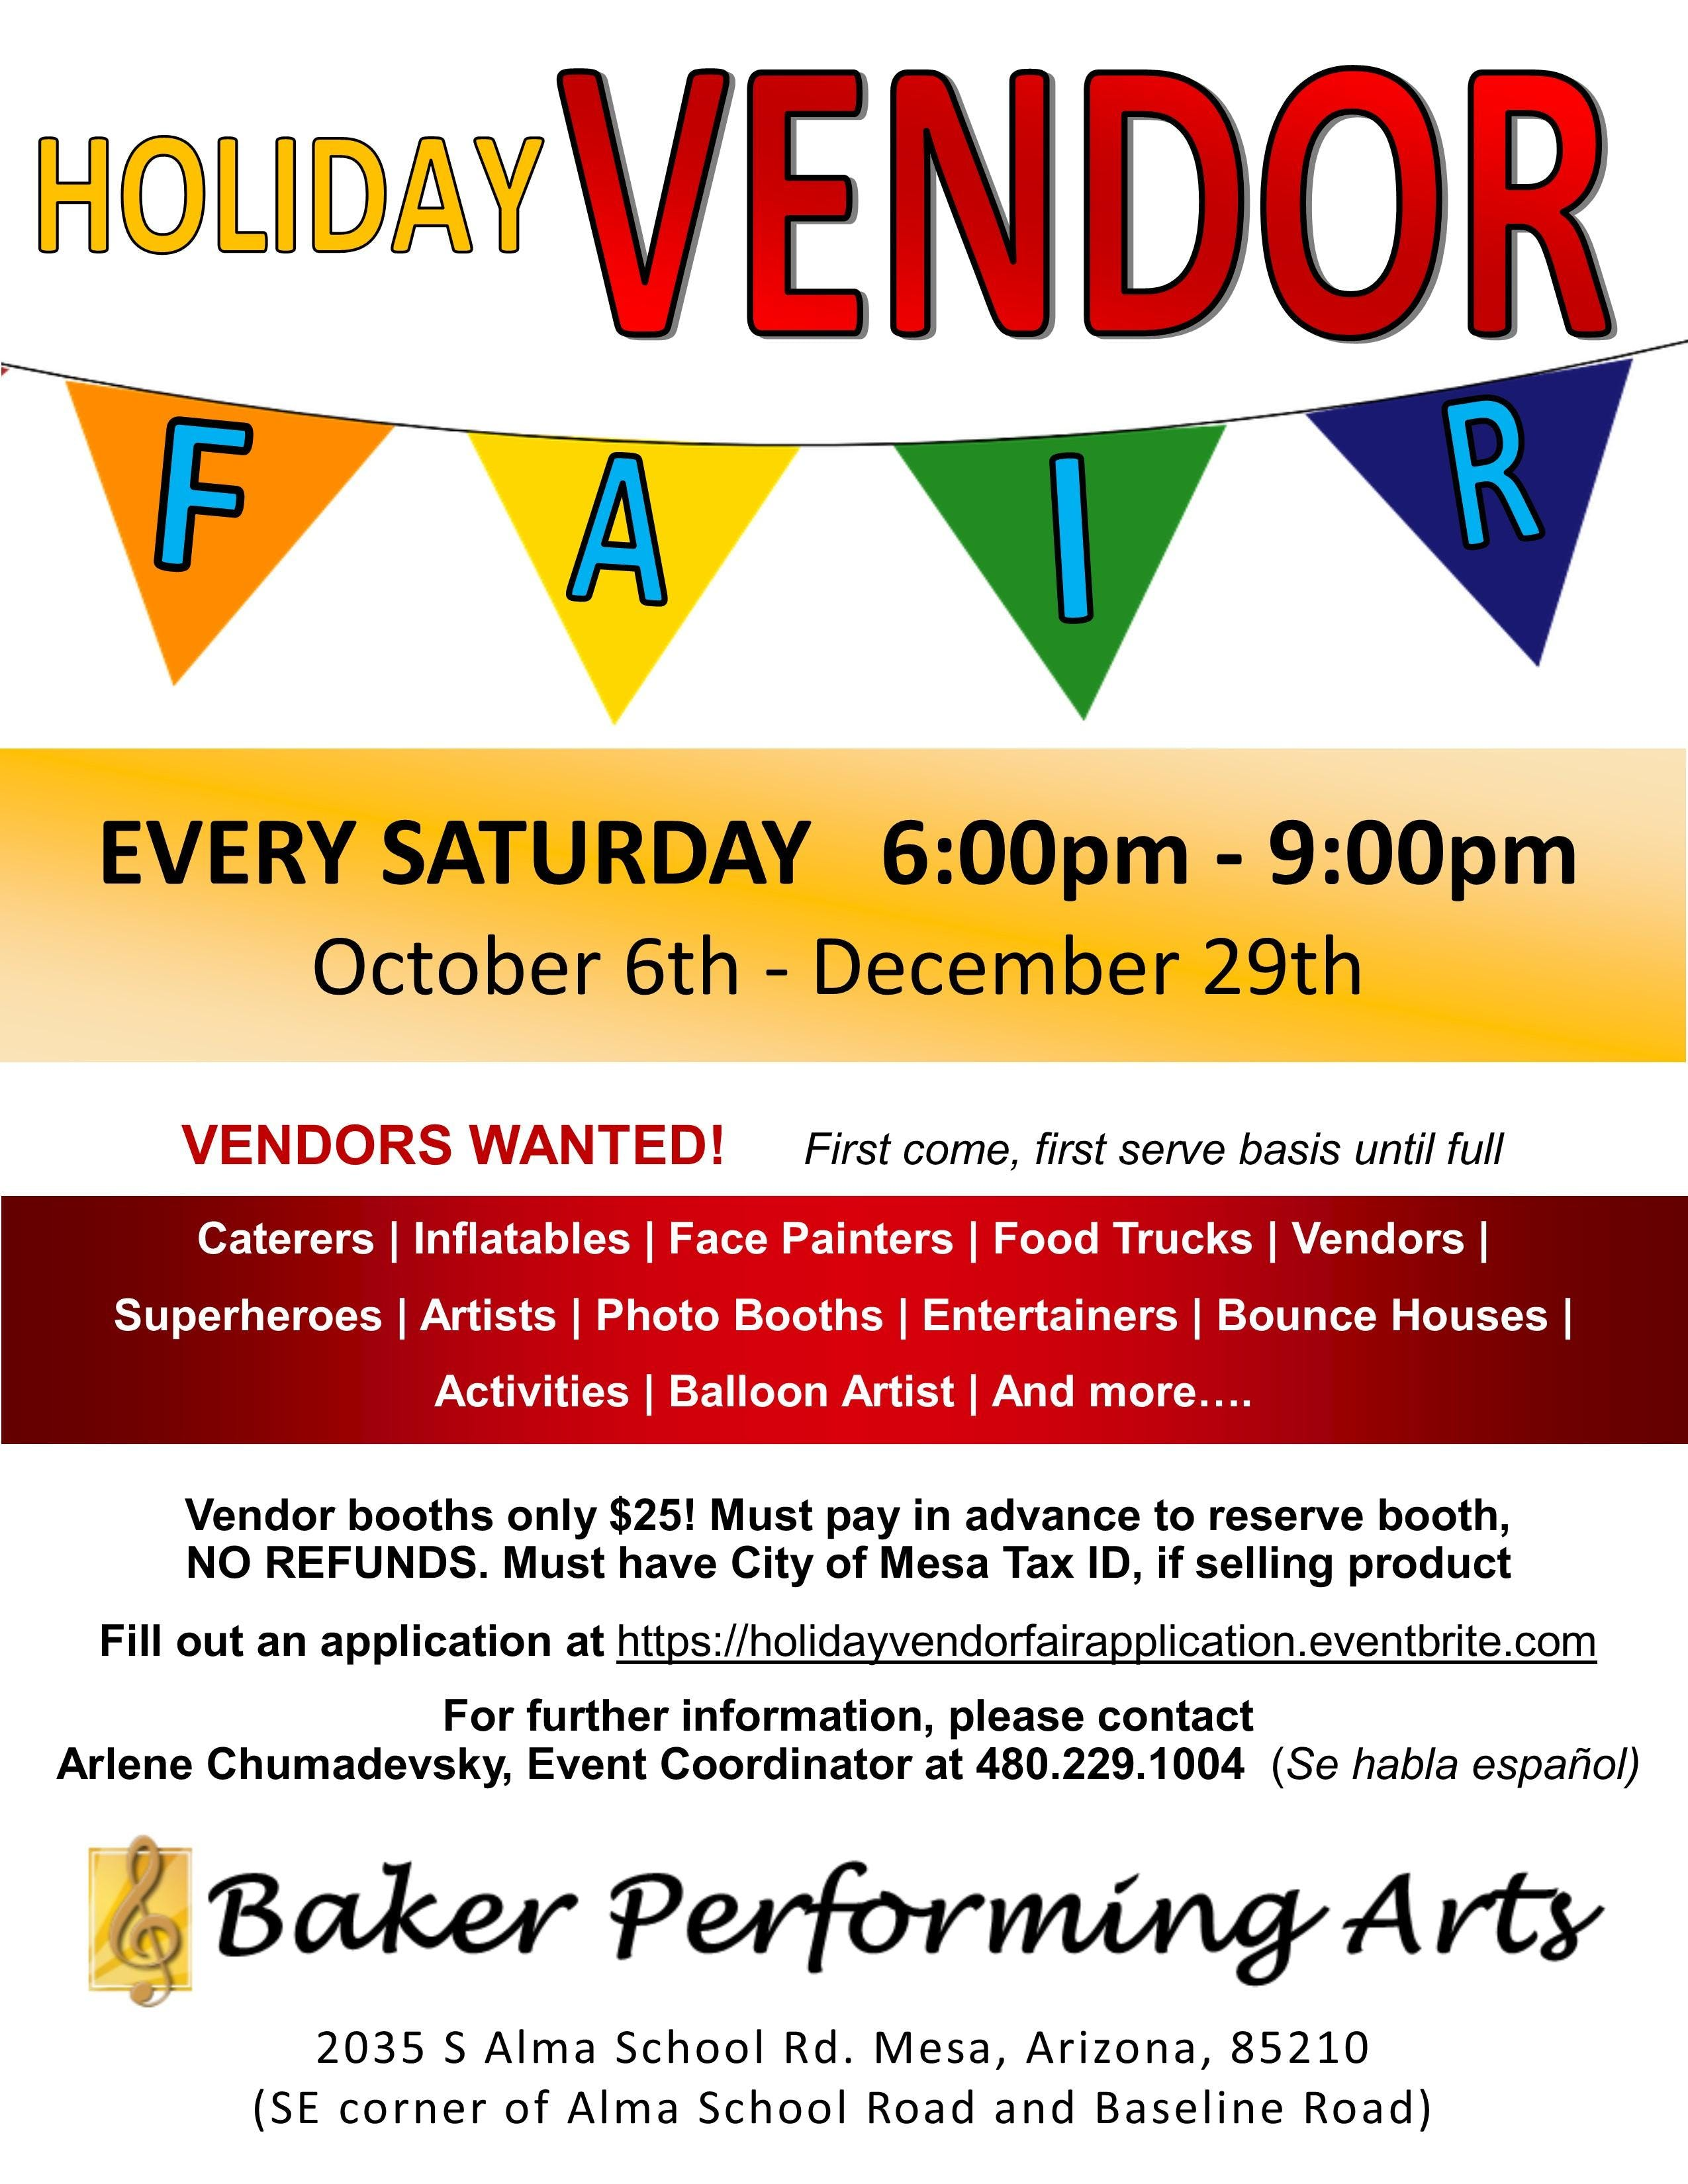 Holiday Vendor Fair Application